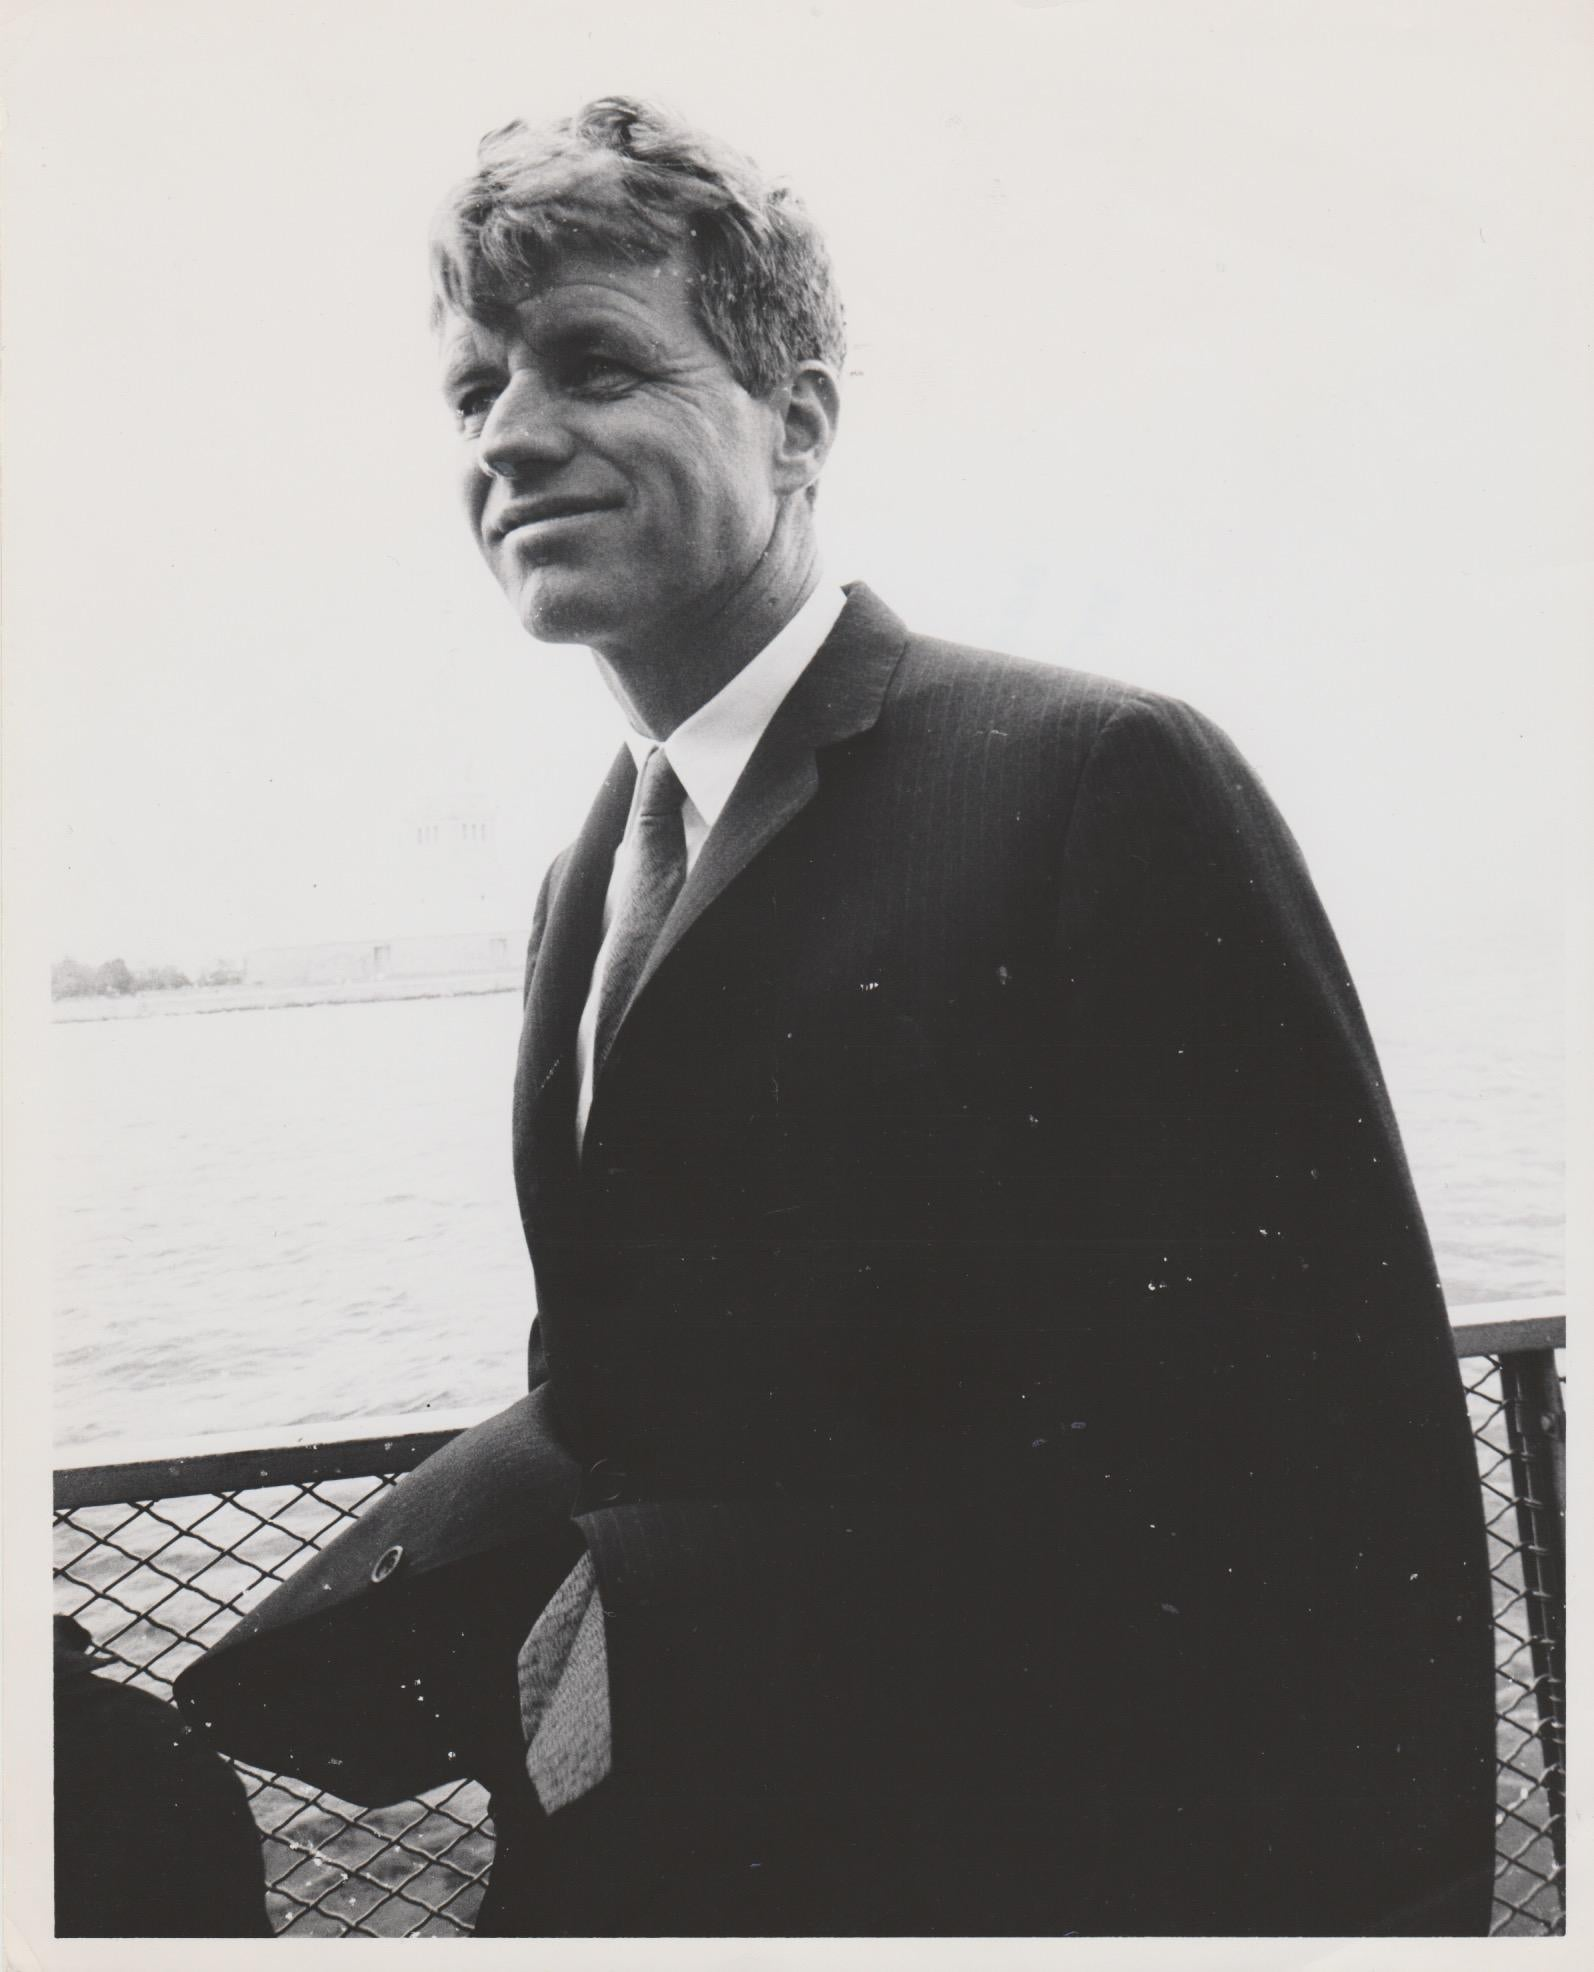 Henry Grossman, Bobby Kennedy, Election campaign, 1968